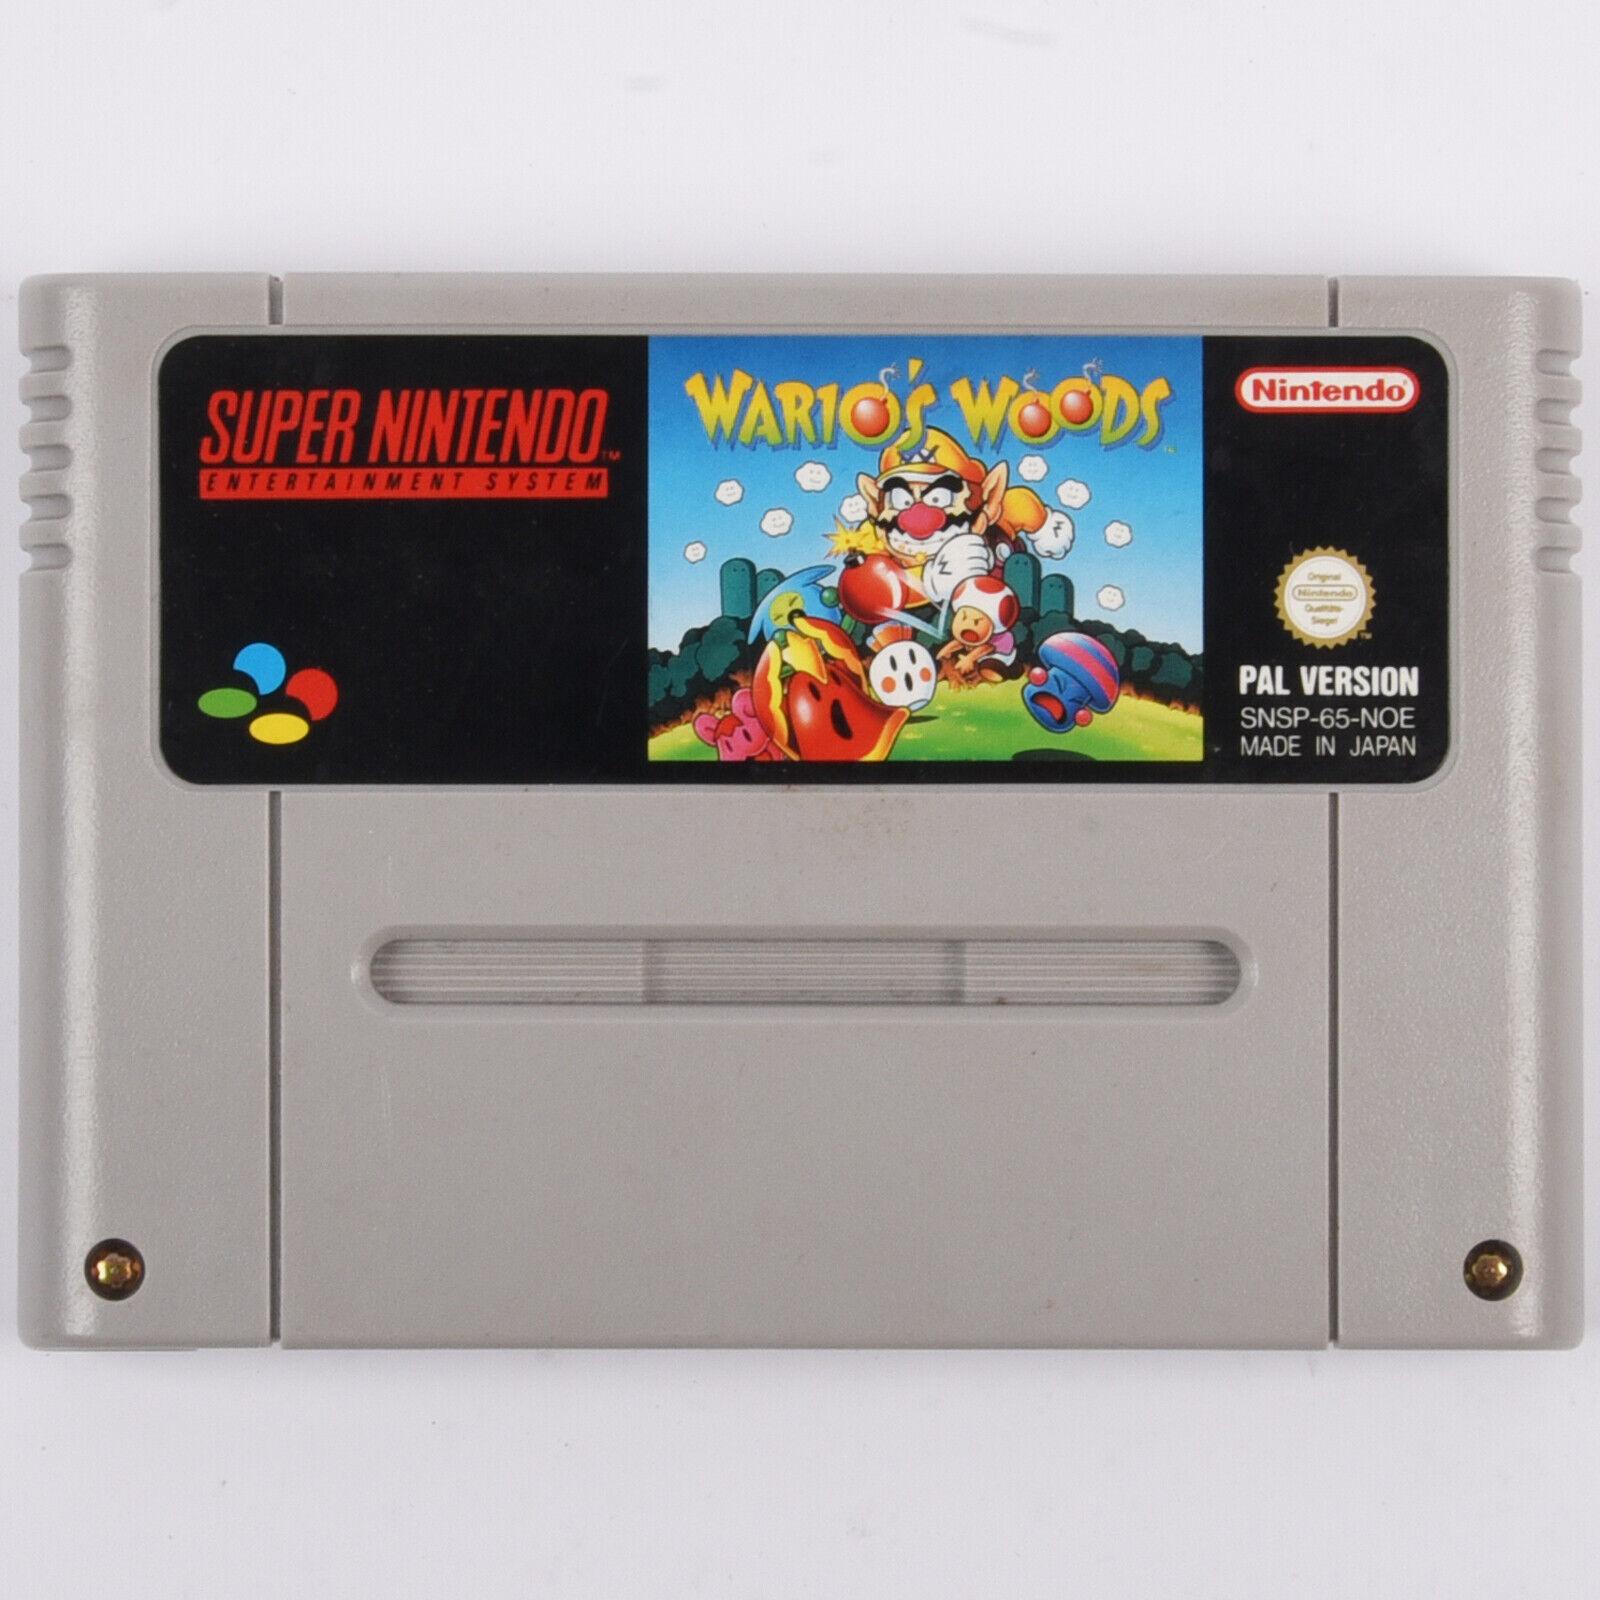 Snes - Wario's Woods Spiel Für Super Nintendo